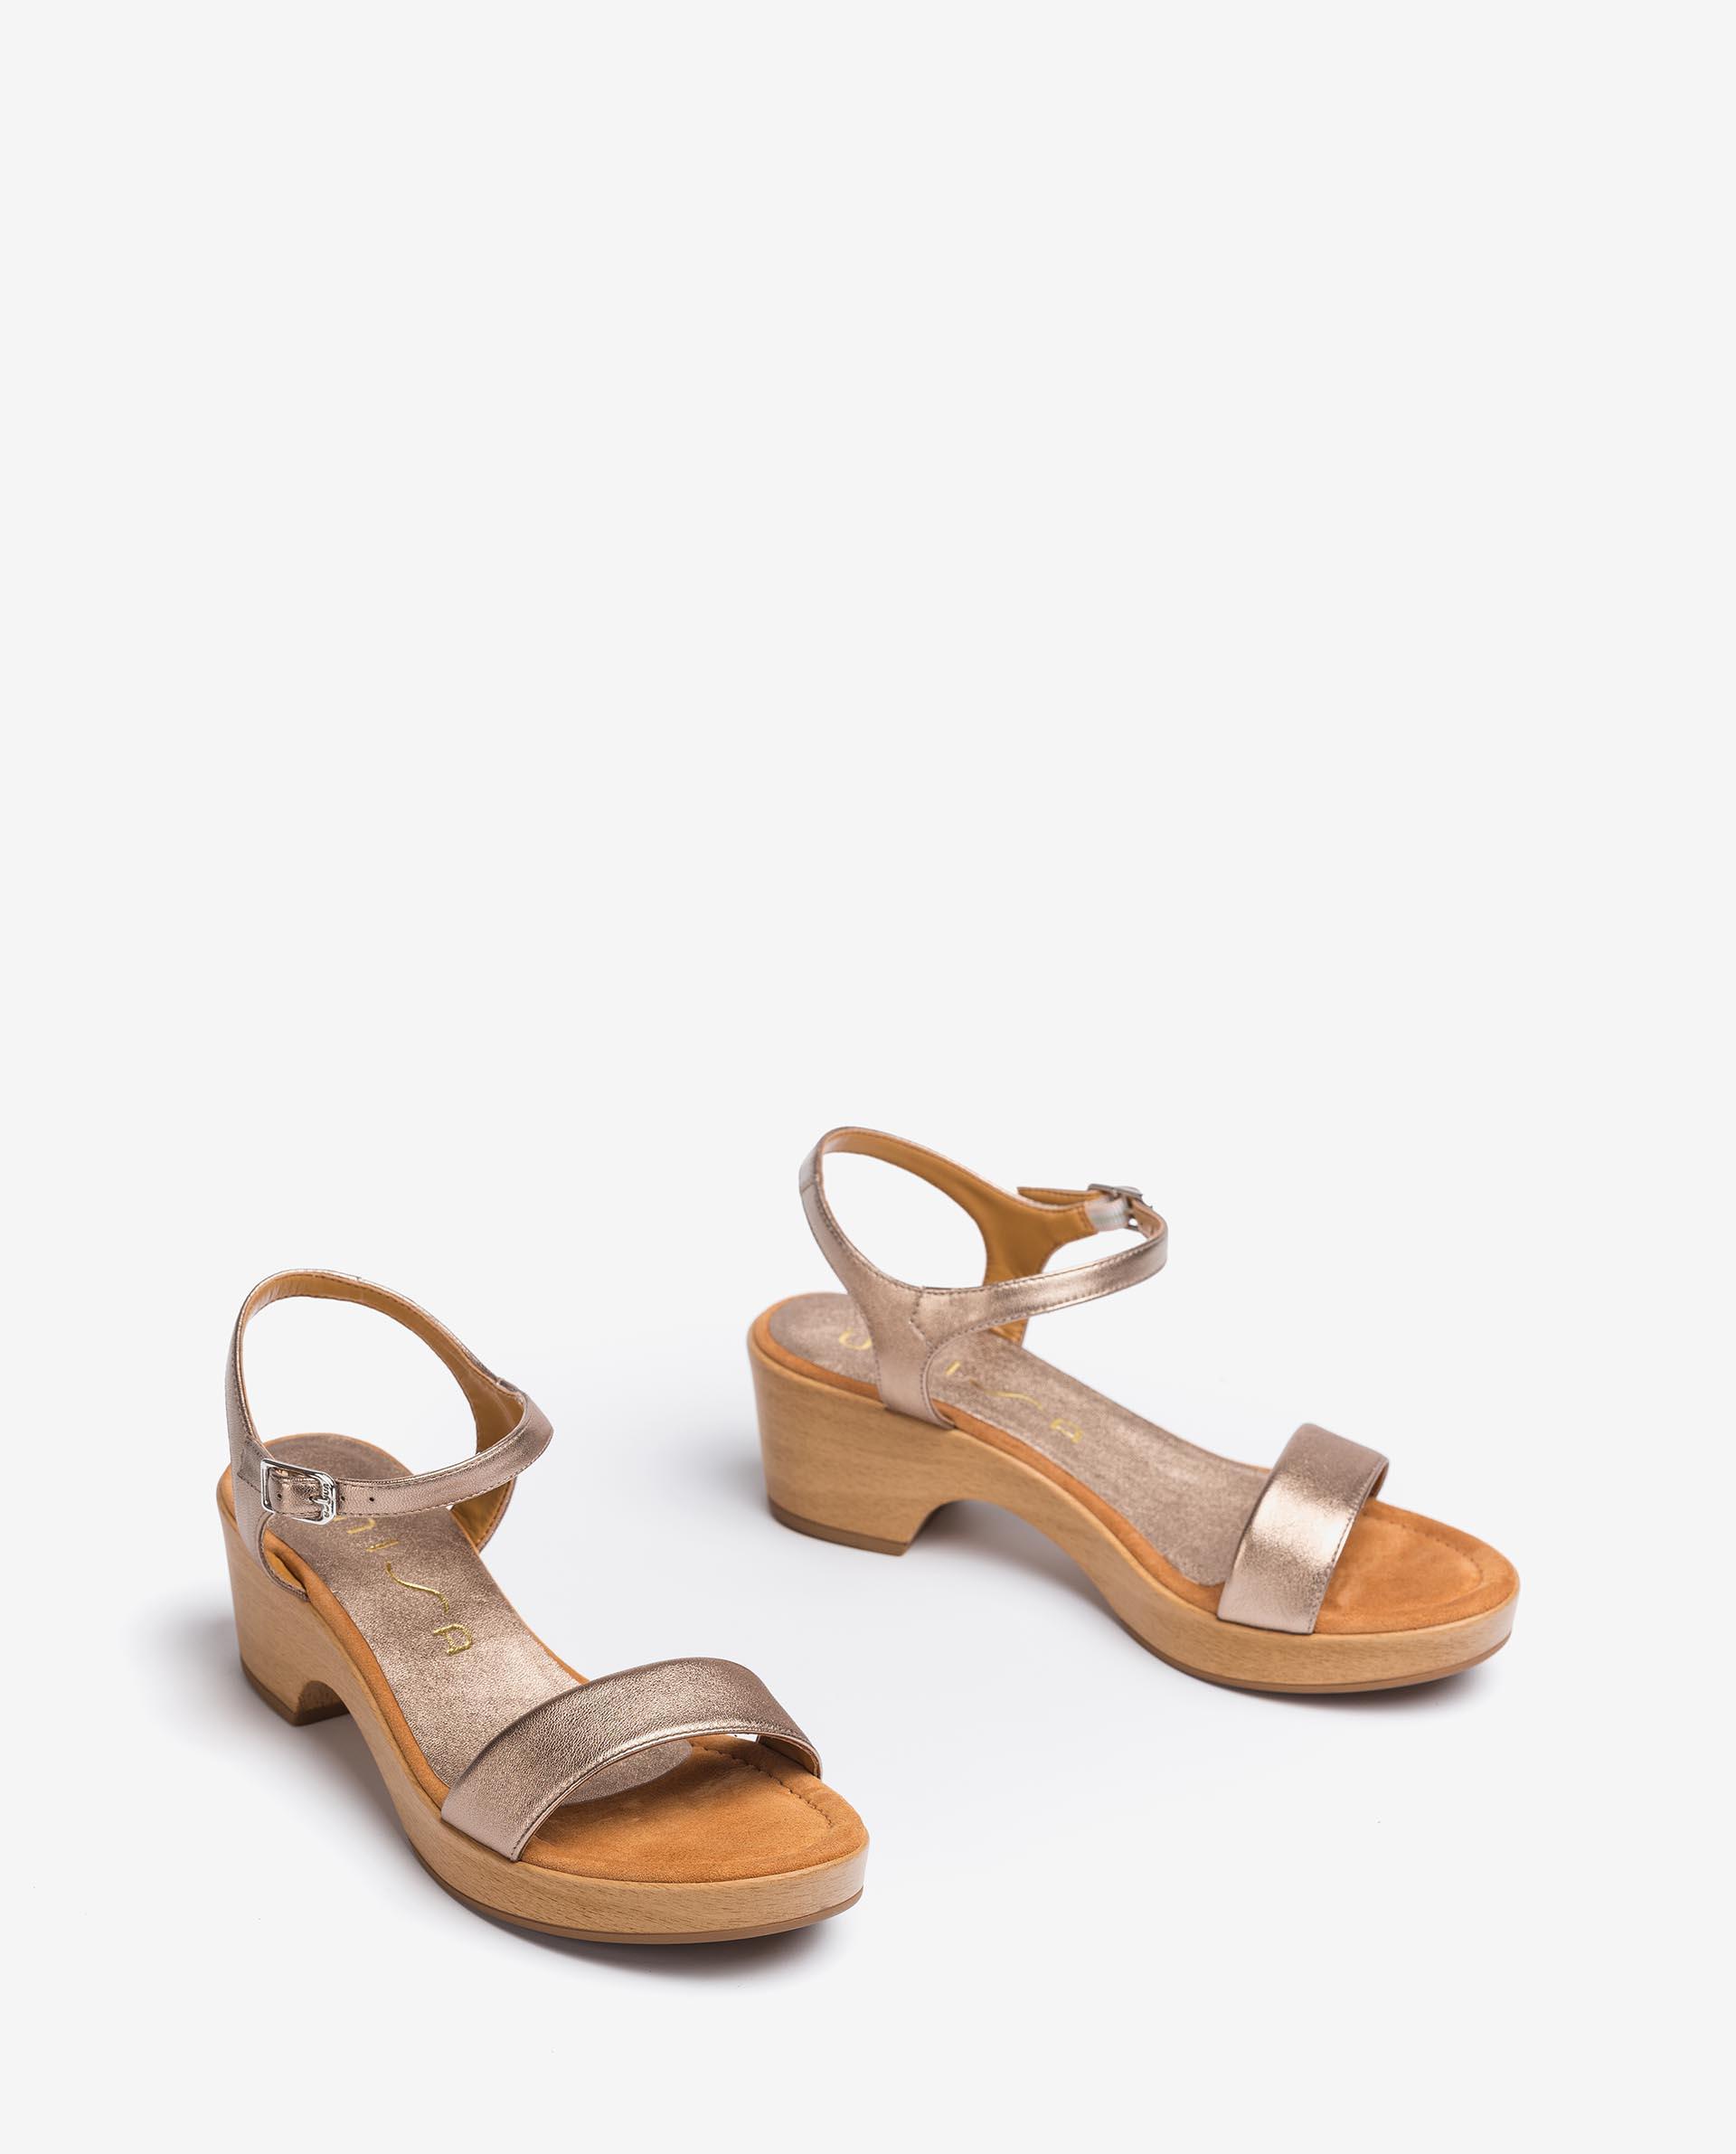 UNISA Metal effect leather block sandals IRITA_21_LMT 2